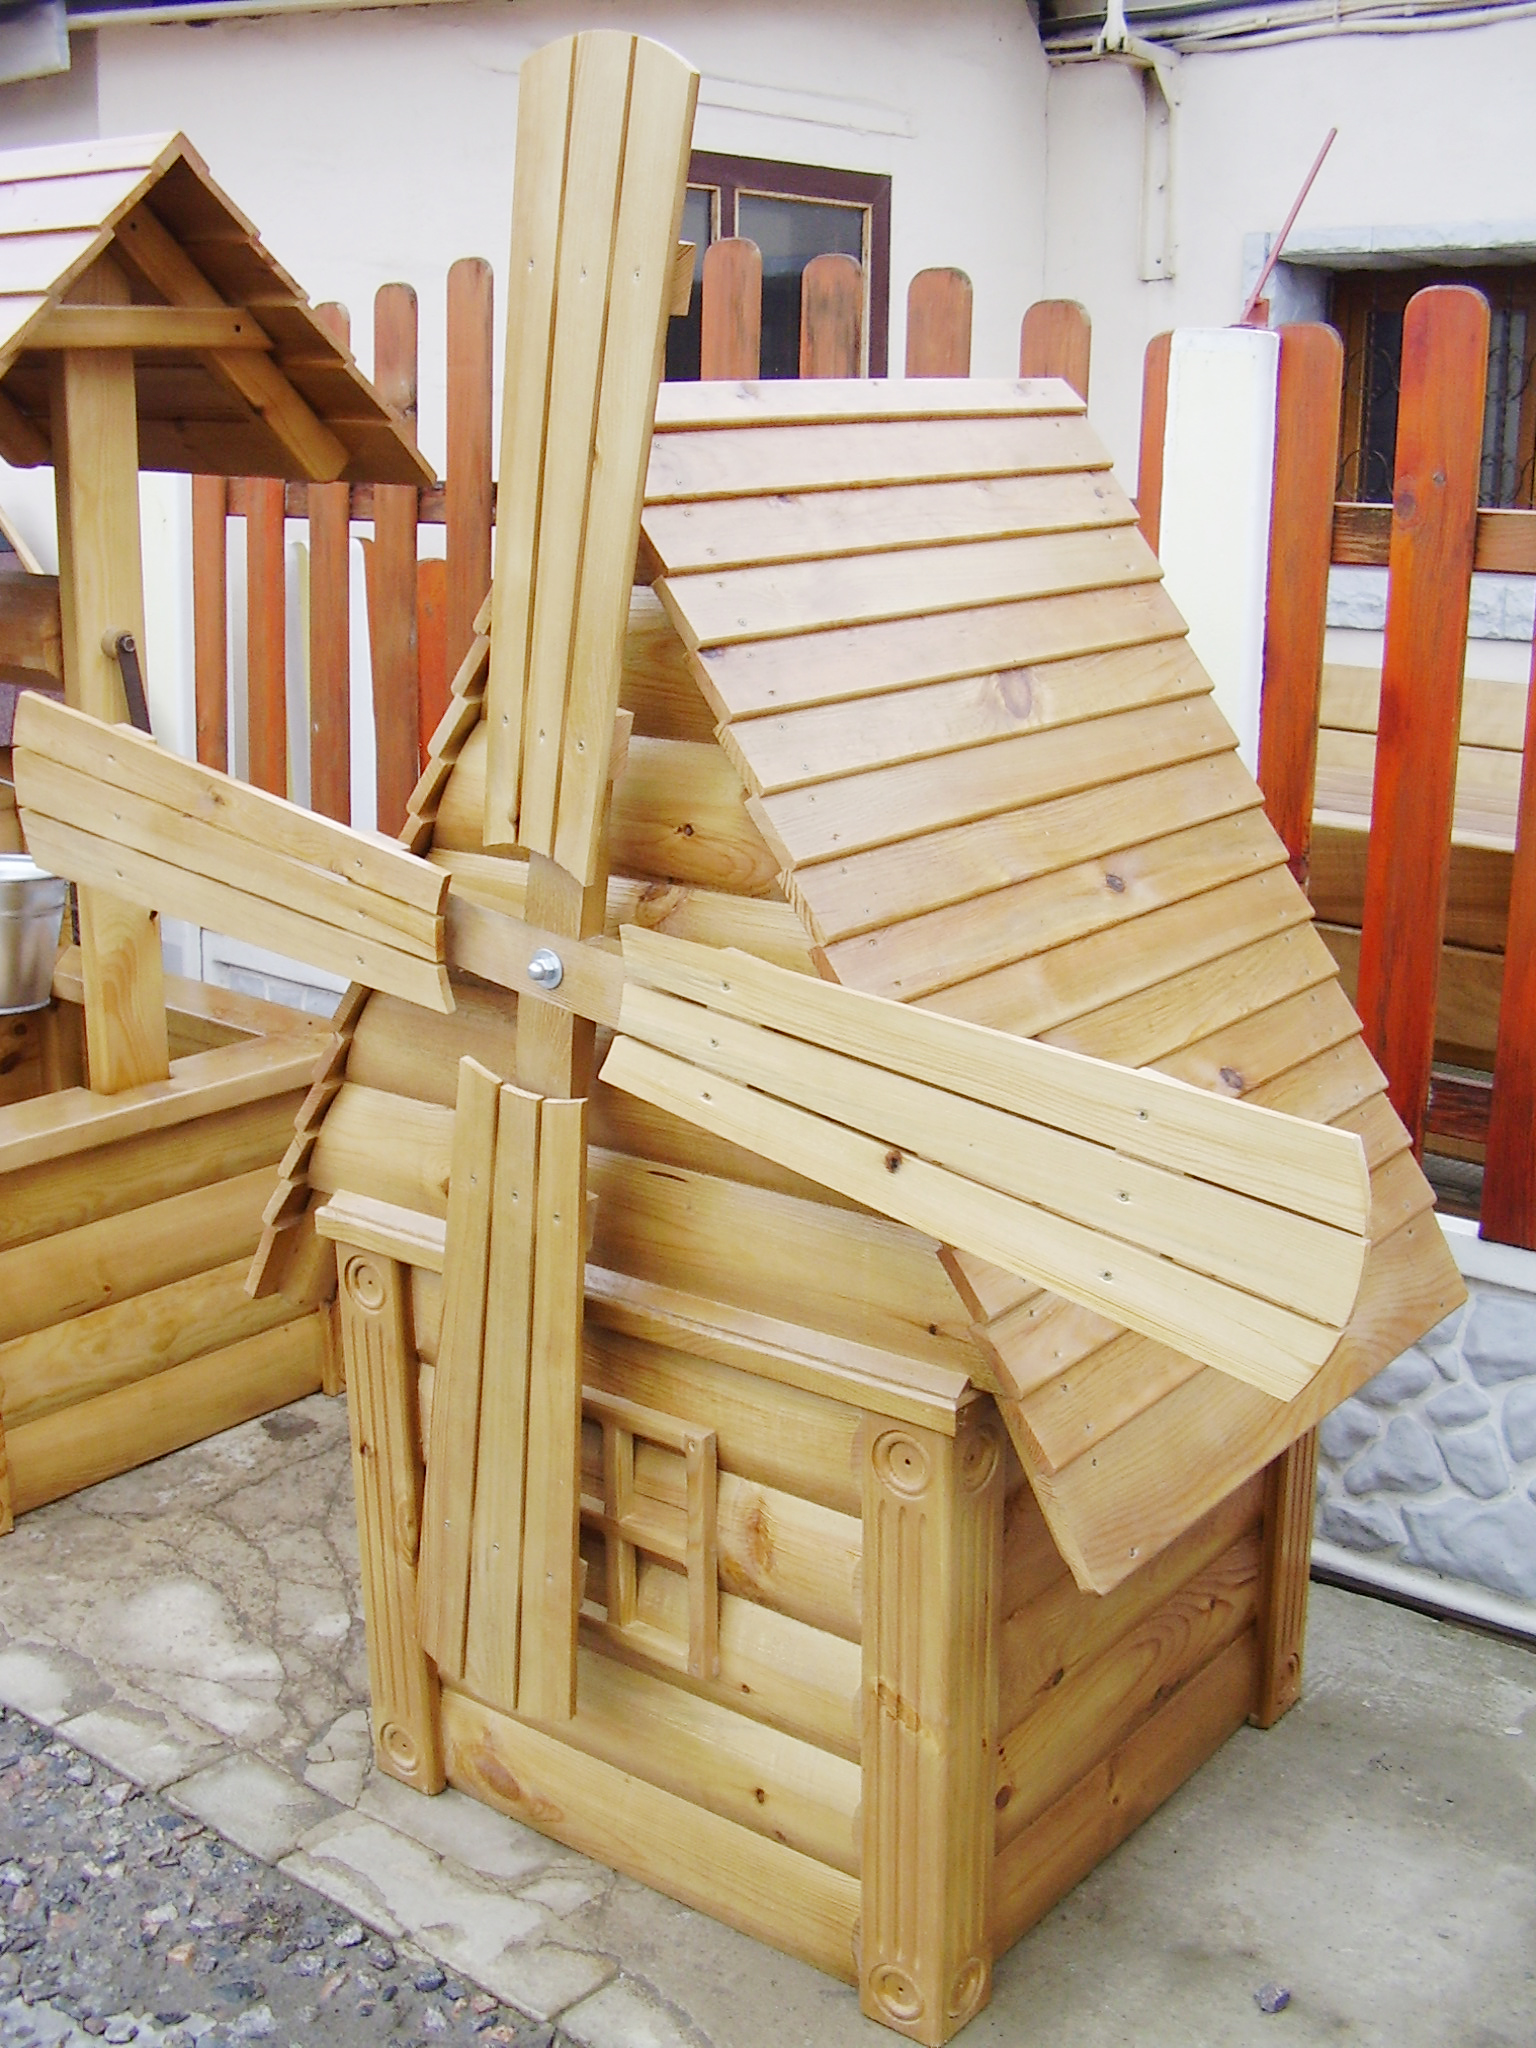 Декоративная мельница из светлого дерева для дачи